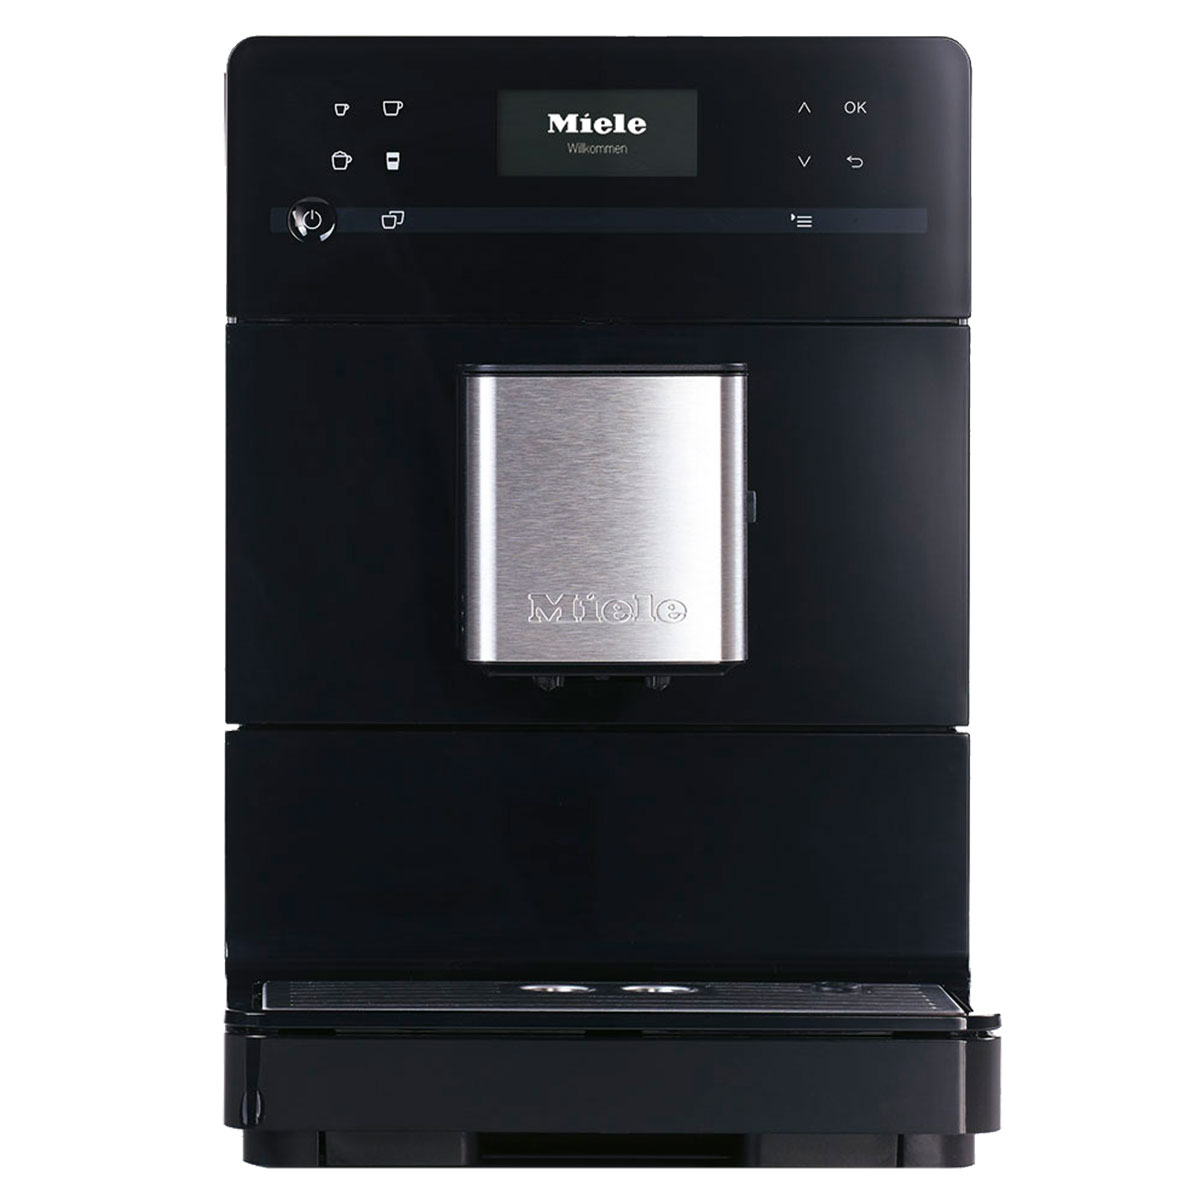 Image of   Miele espressomaskine - CM 5300 - Obsidian black